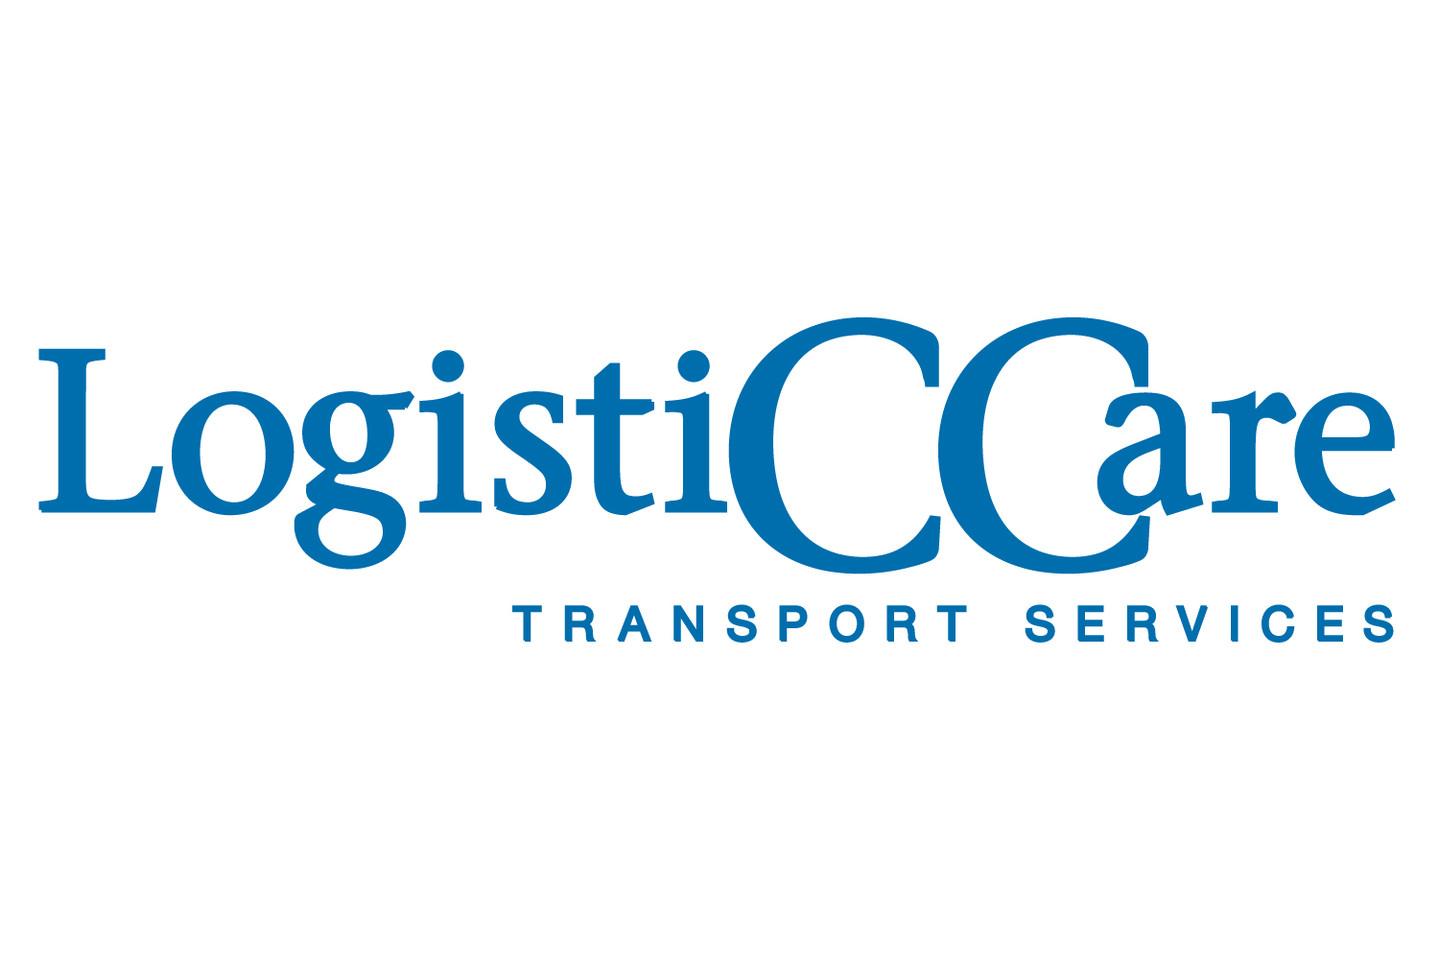 Logisticcare